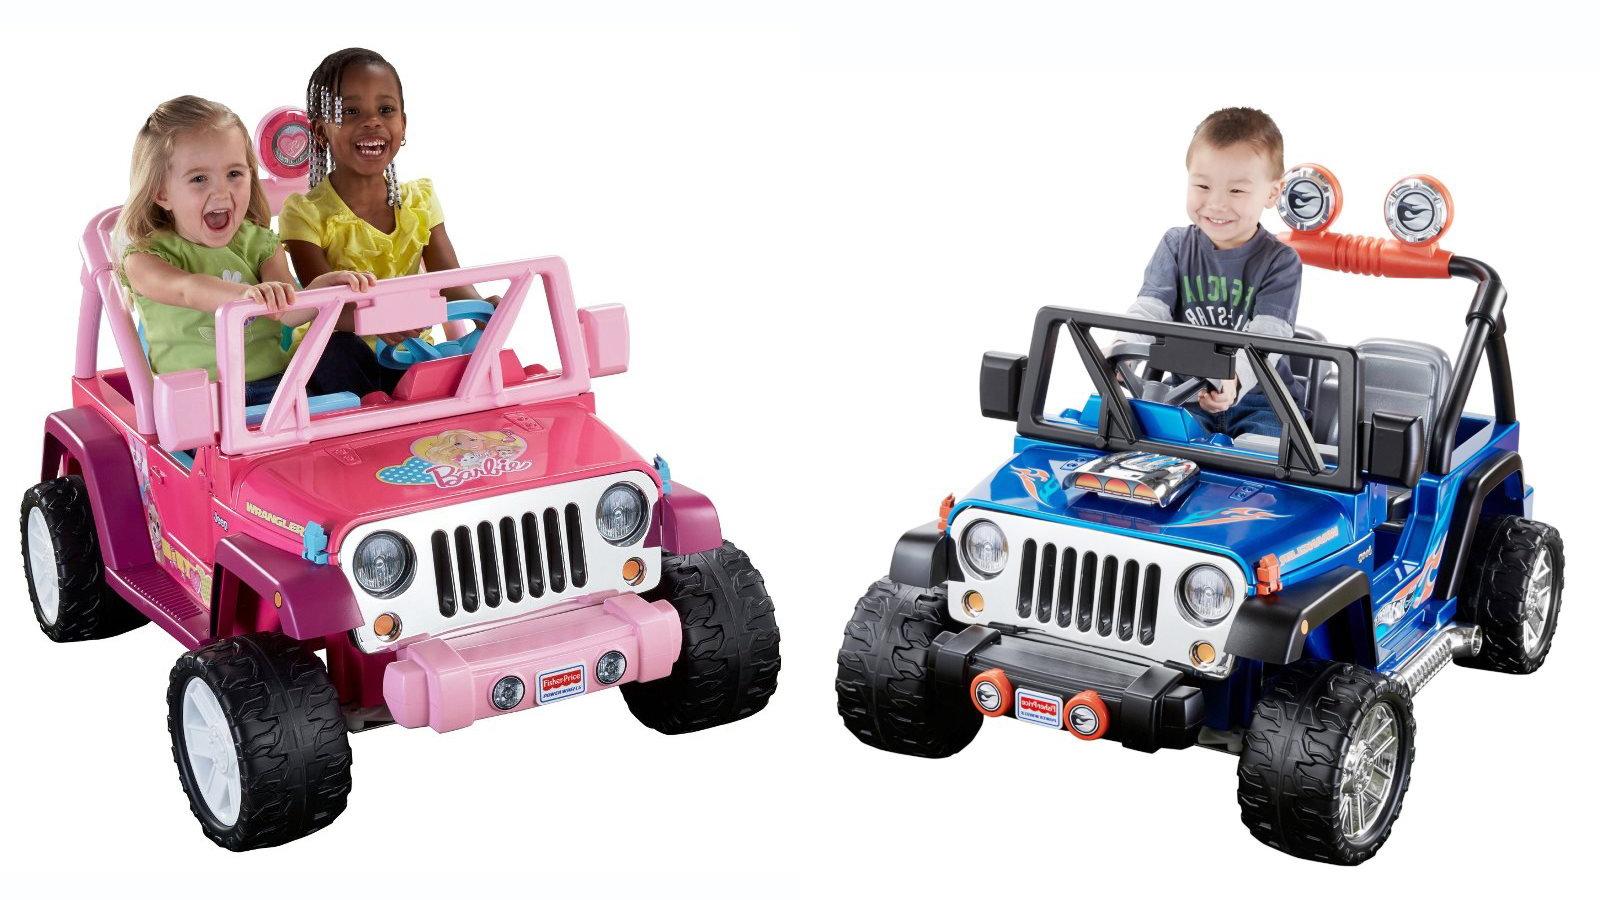 The Power Wheels Jammin' Jeep Wrangler